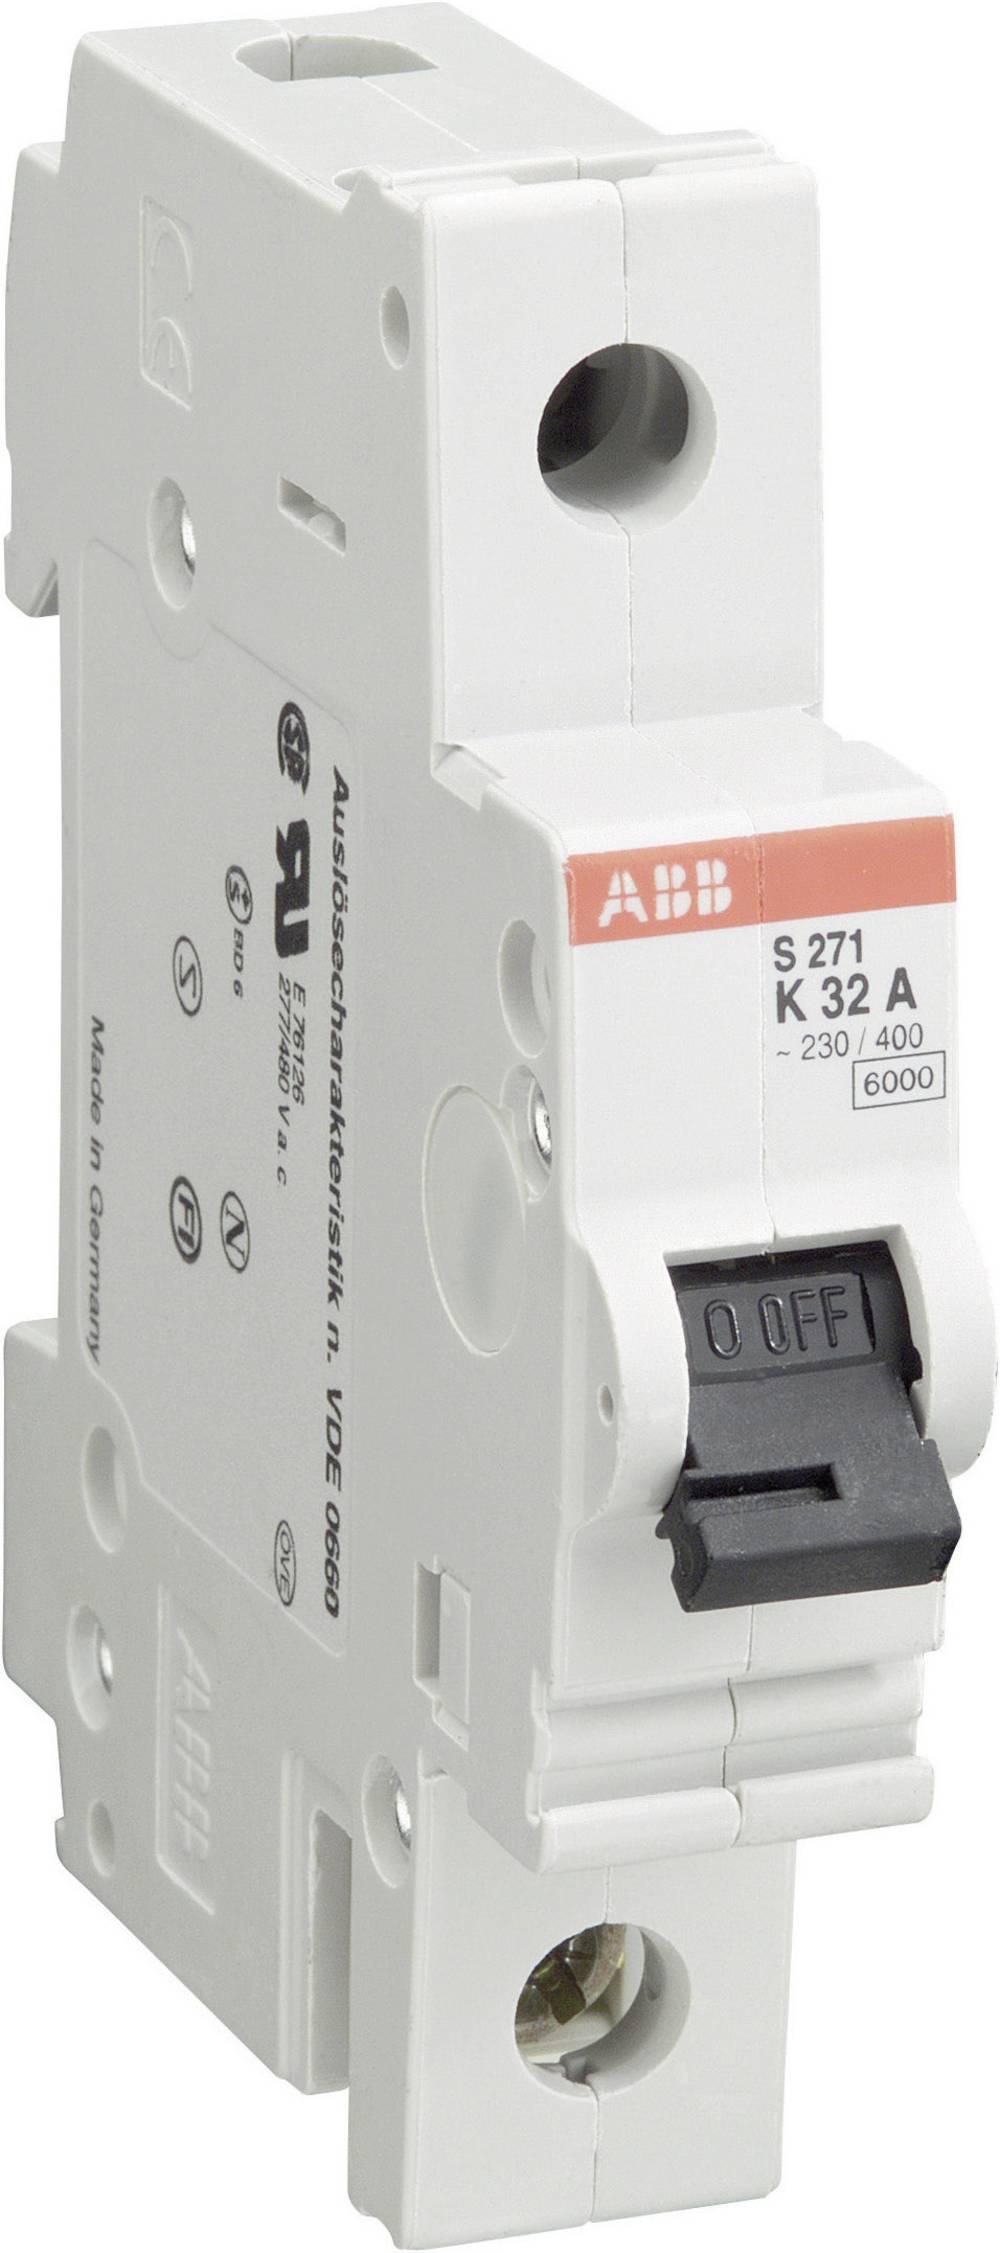 Instalacijski prekidač 1-polni 32 A ABB 2CDS251001R0324